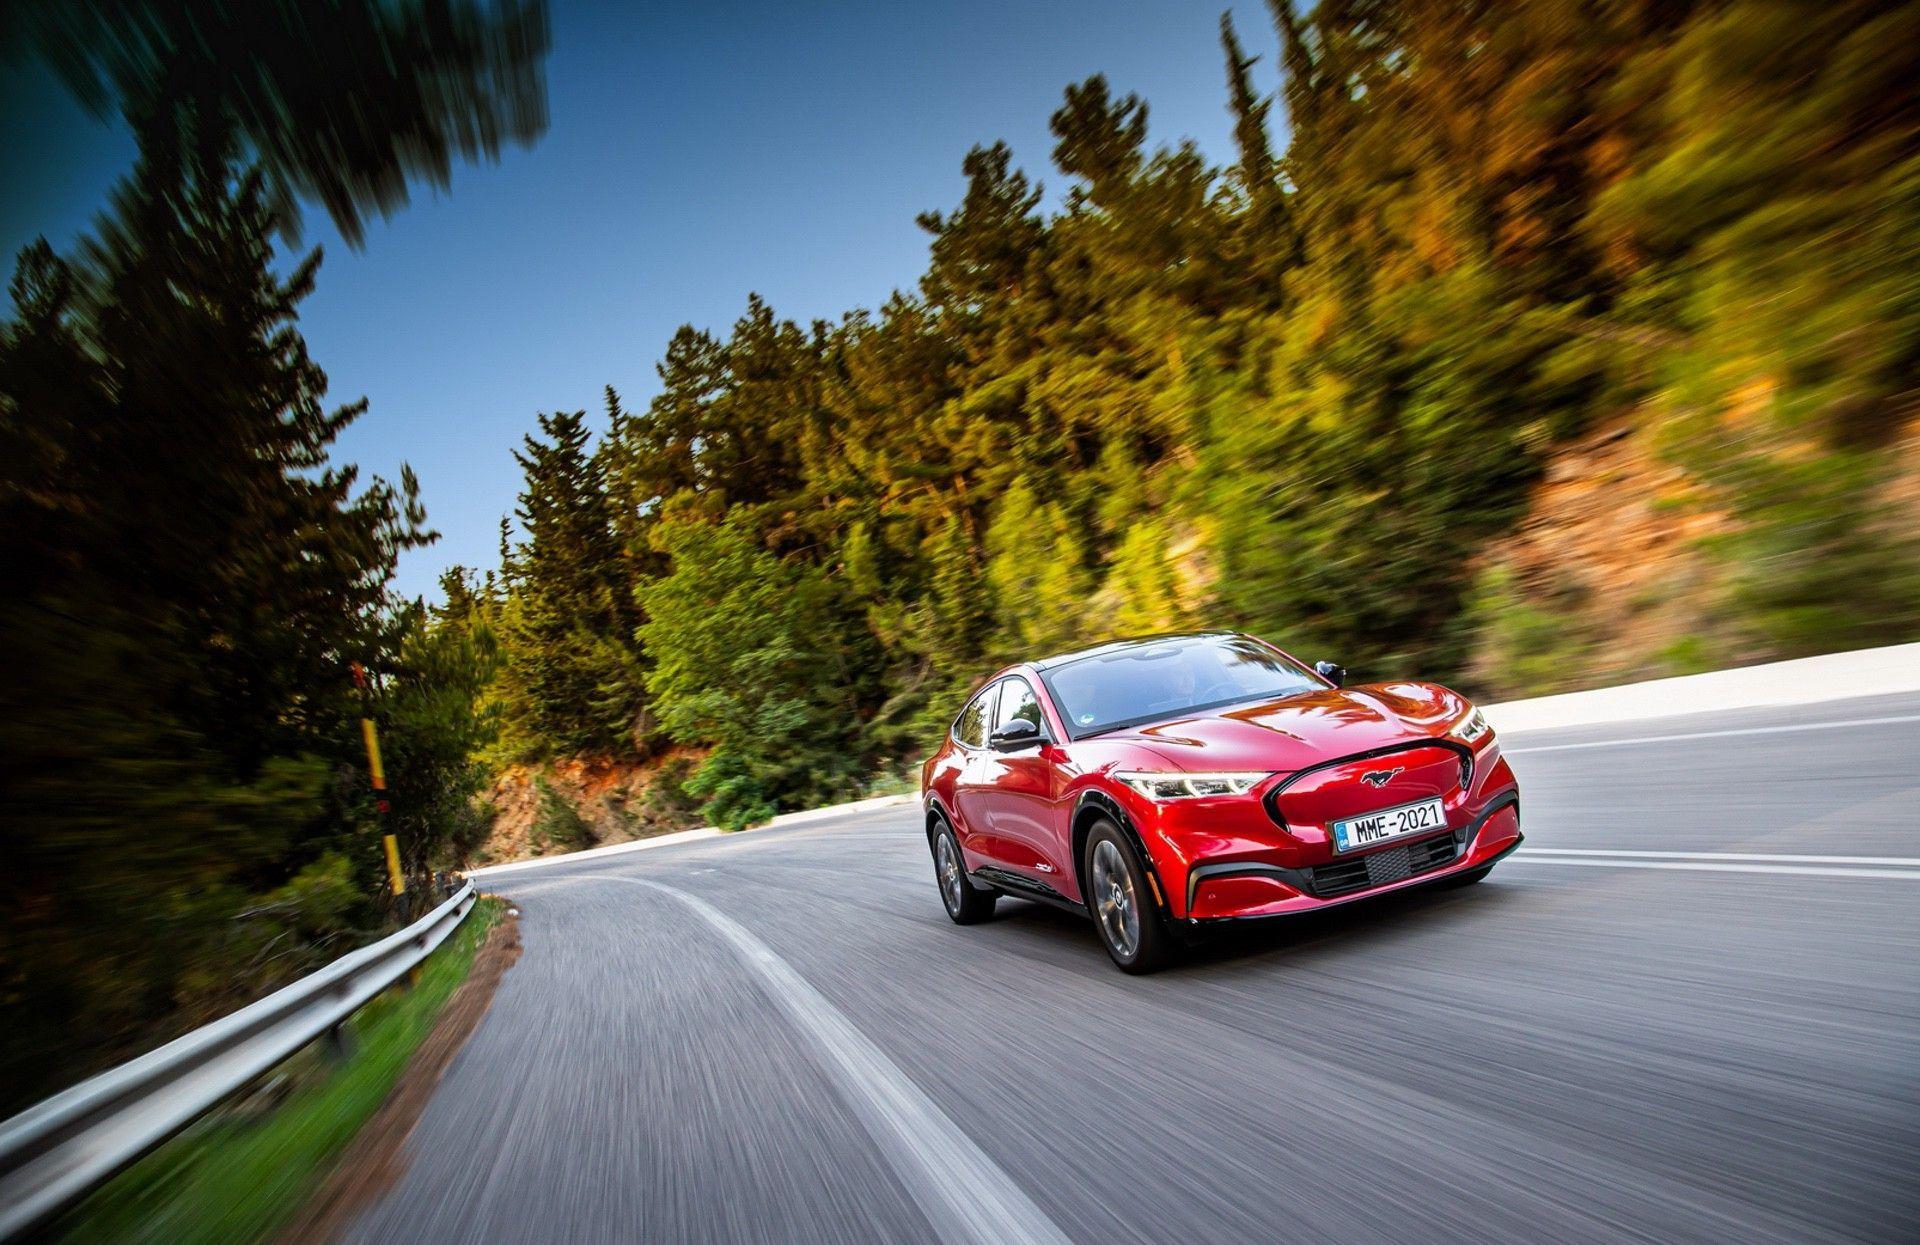 Ford_Mustang_Mach-E_greek_presskit-0089